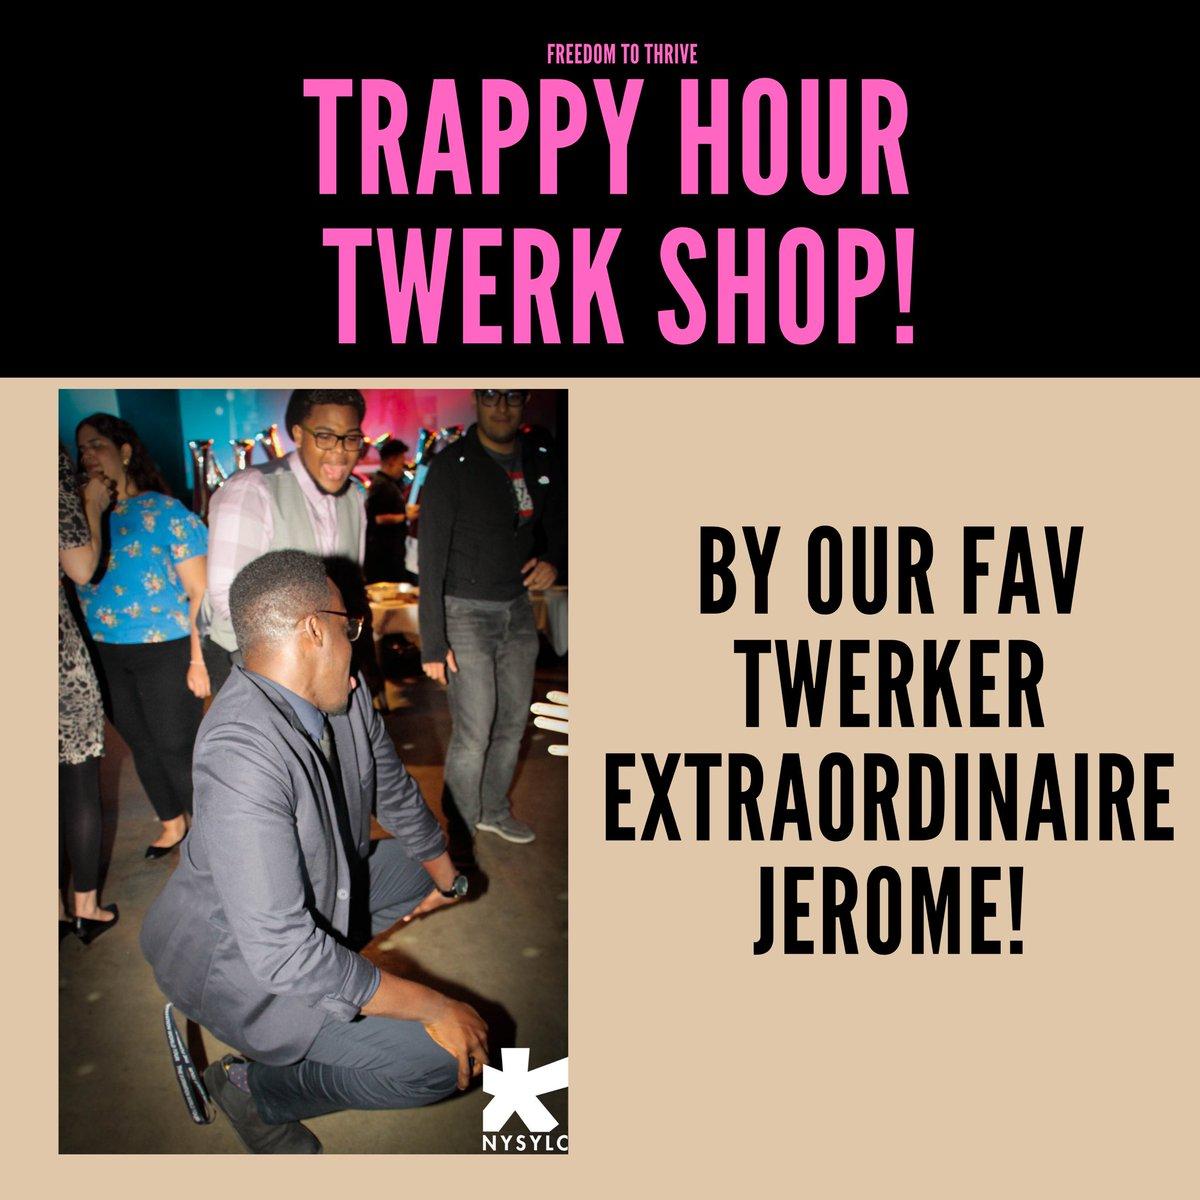 Twerking with Jerome!